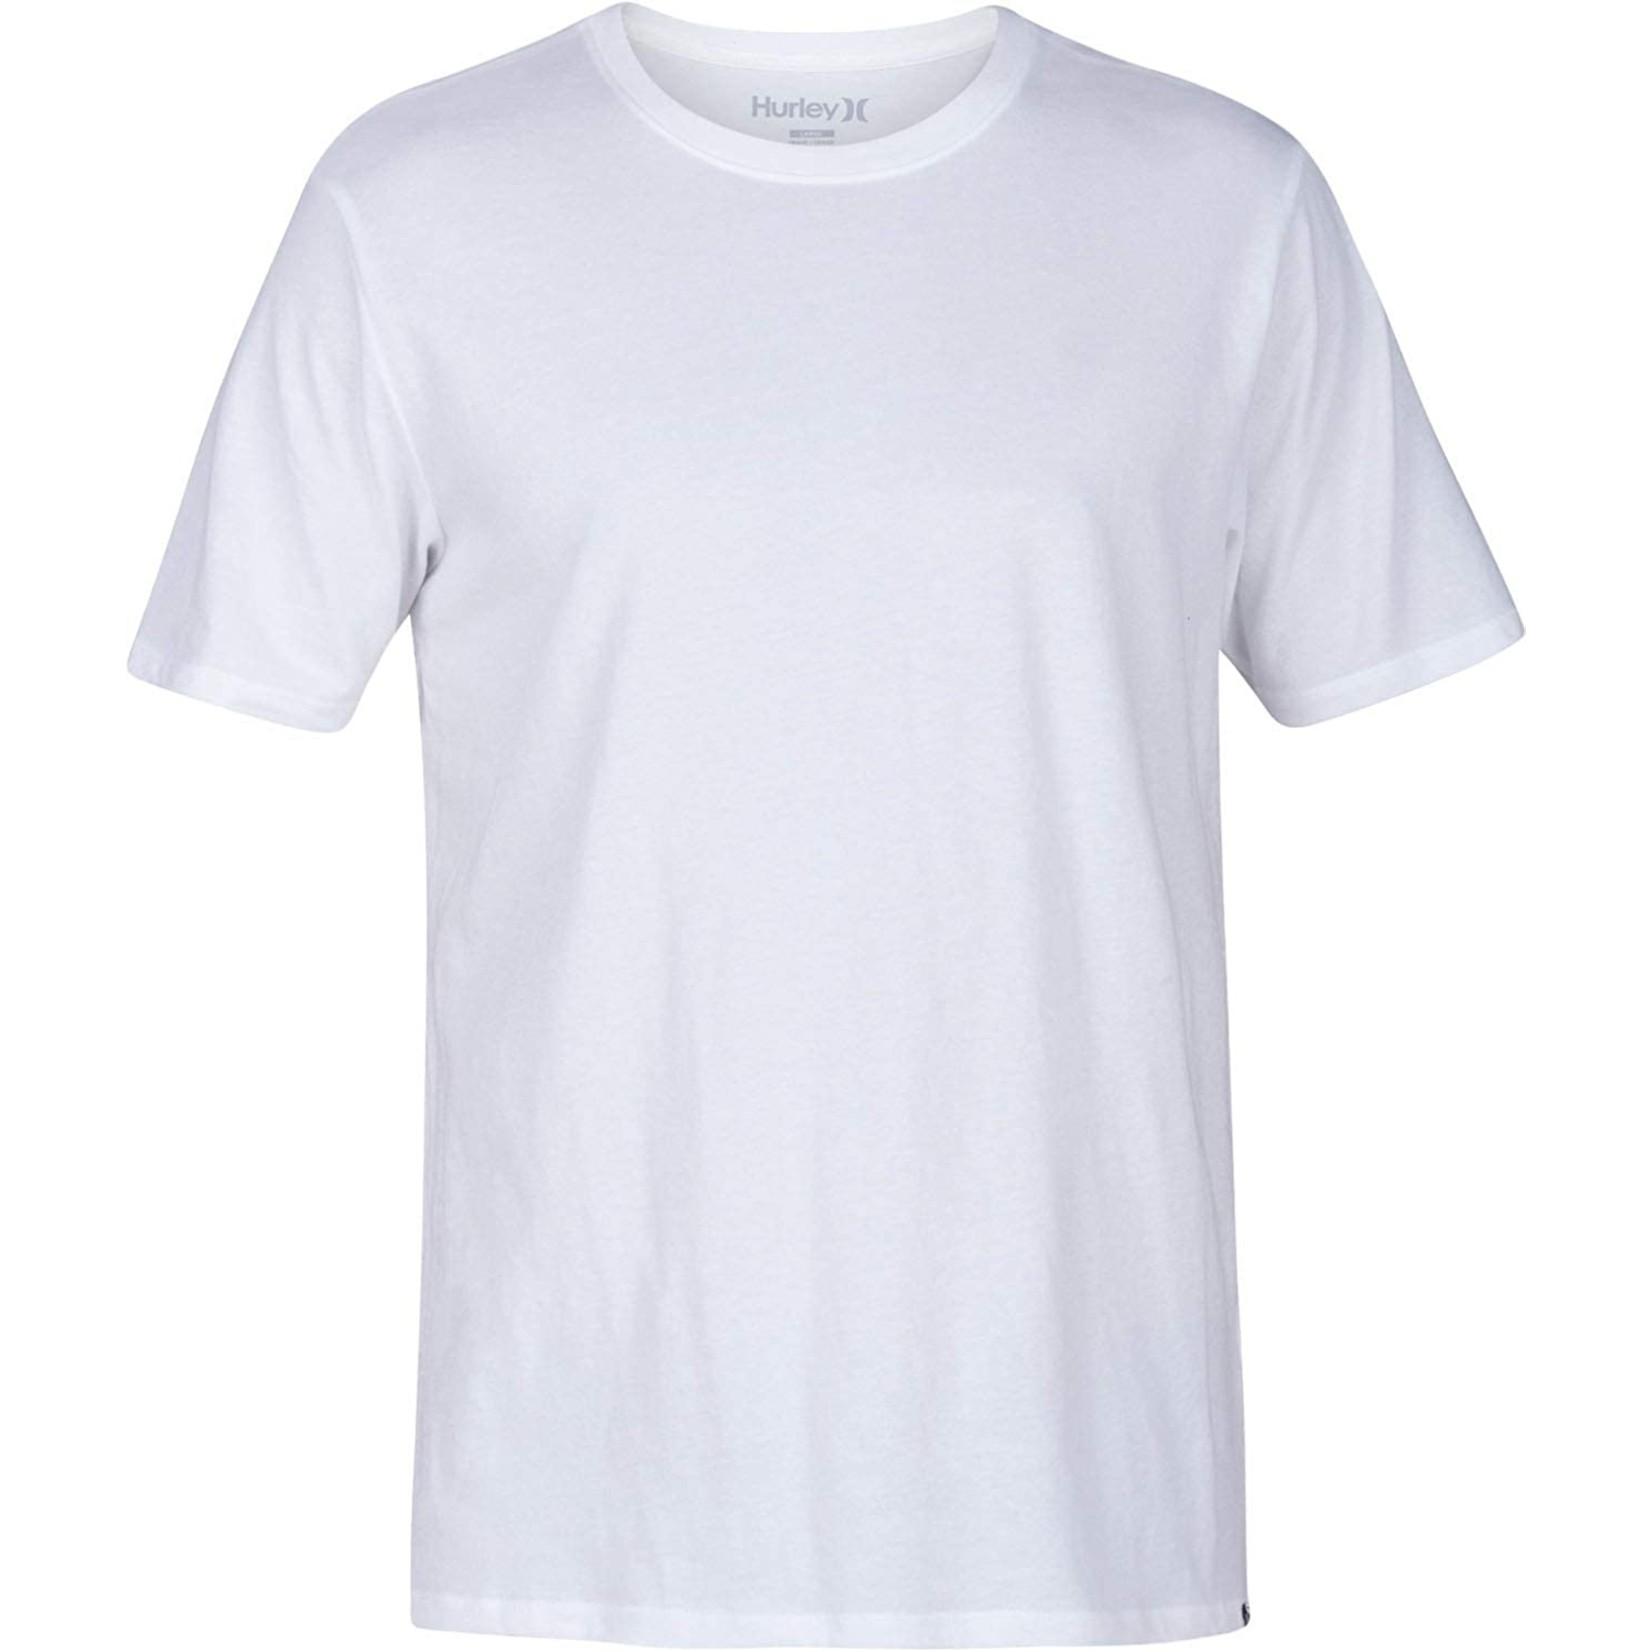 Hurley Hurley T-Shirt, Staple Crew, Mens